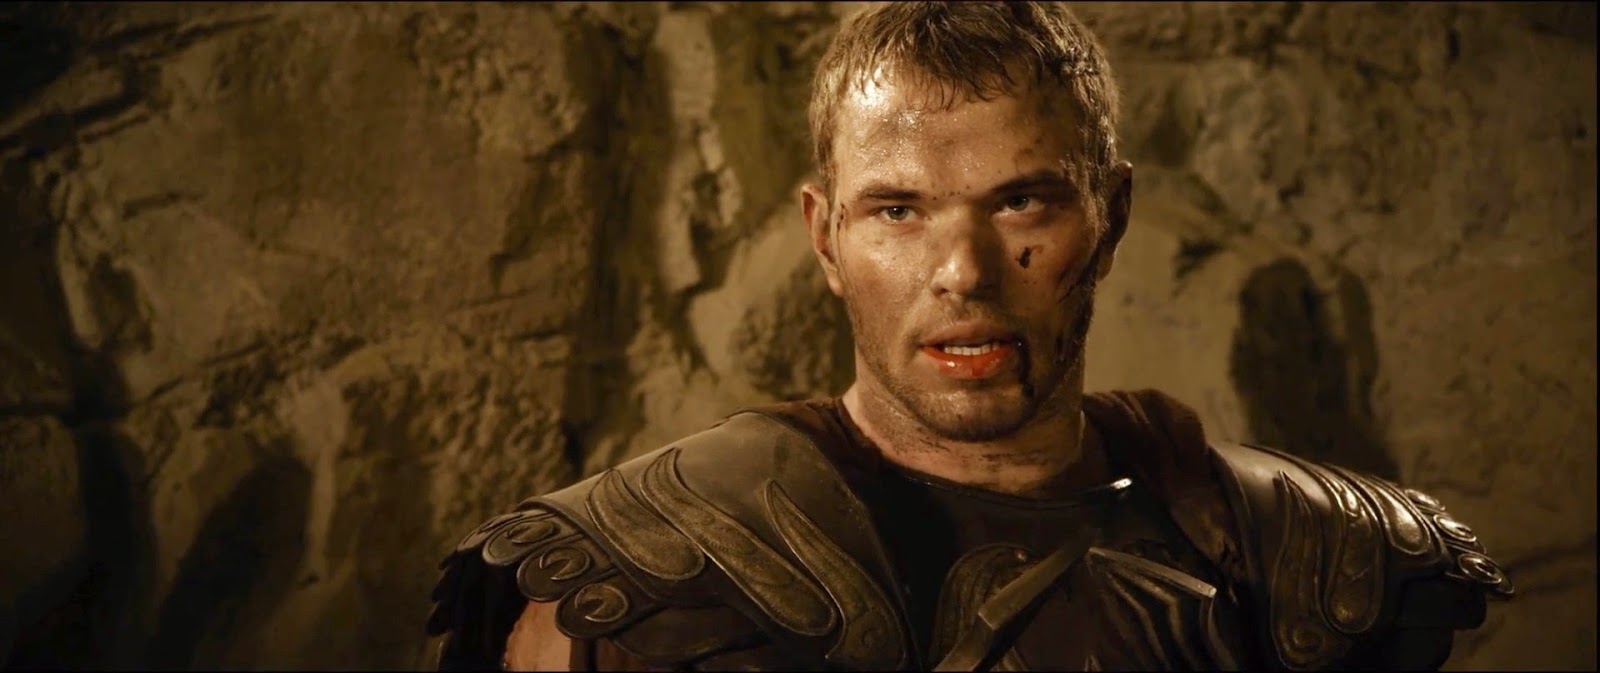 The Legend of Hercules (2014) S3 s The Legend of Hercules (2014)